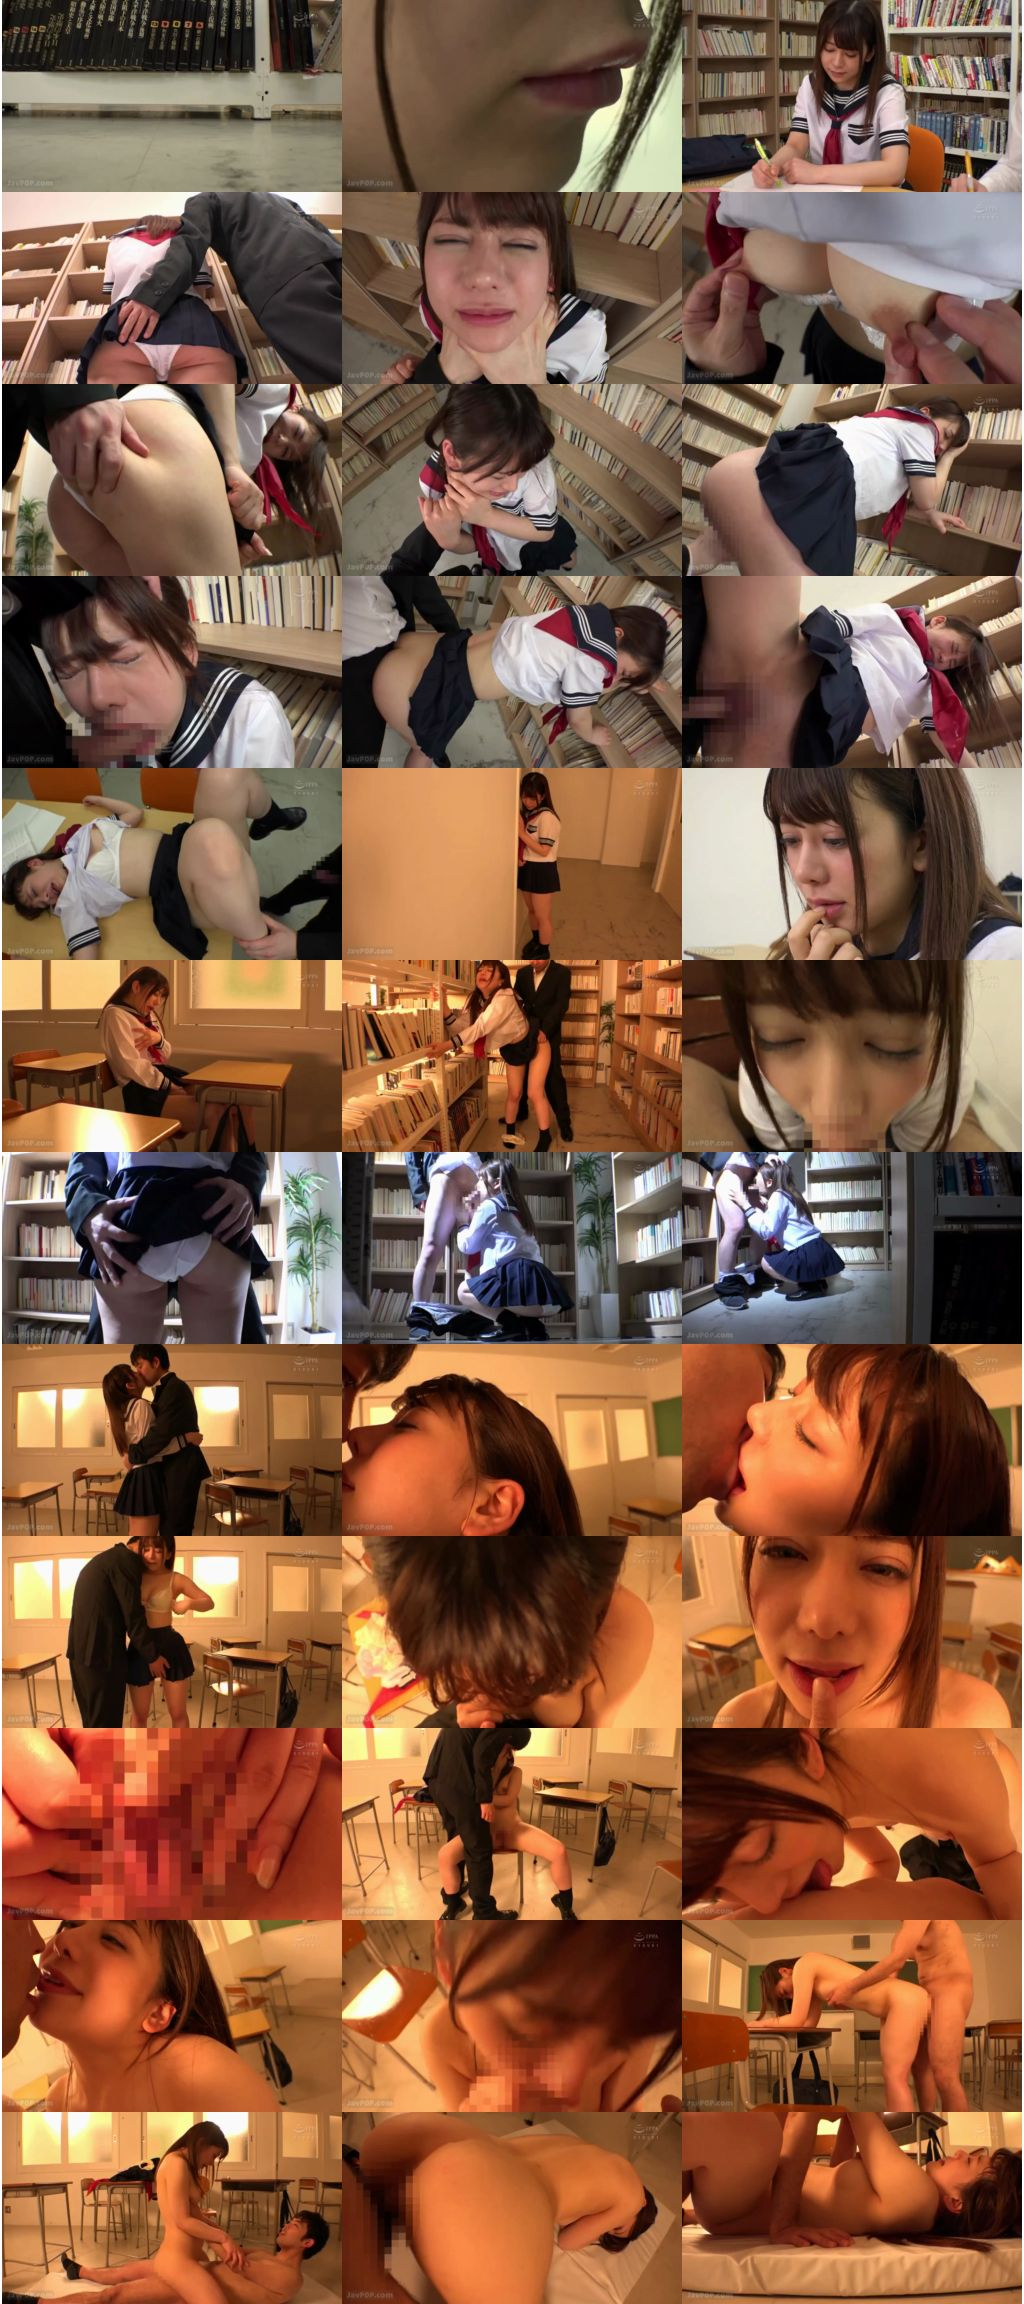 [HBAD-492] 学校で先生と… 女子○生に恋した教師にチ○ポを入れられ反応してしまう若いカラダ 有村のぞみ 単体作品 女子校生 Arimura Nozomi Hibino Babe